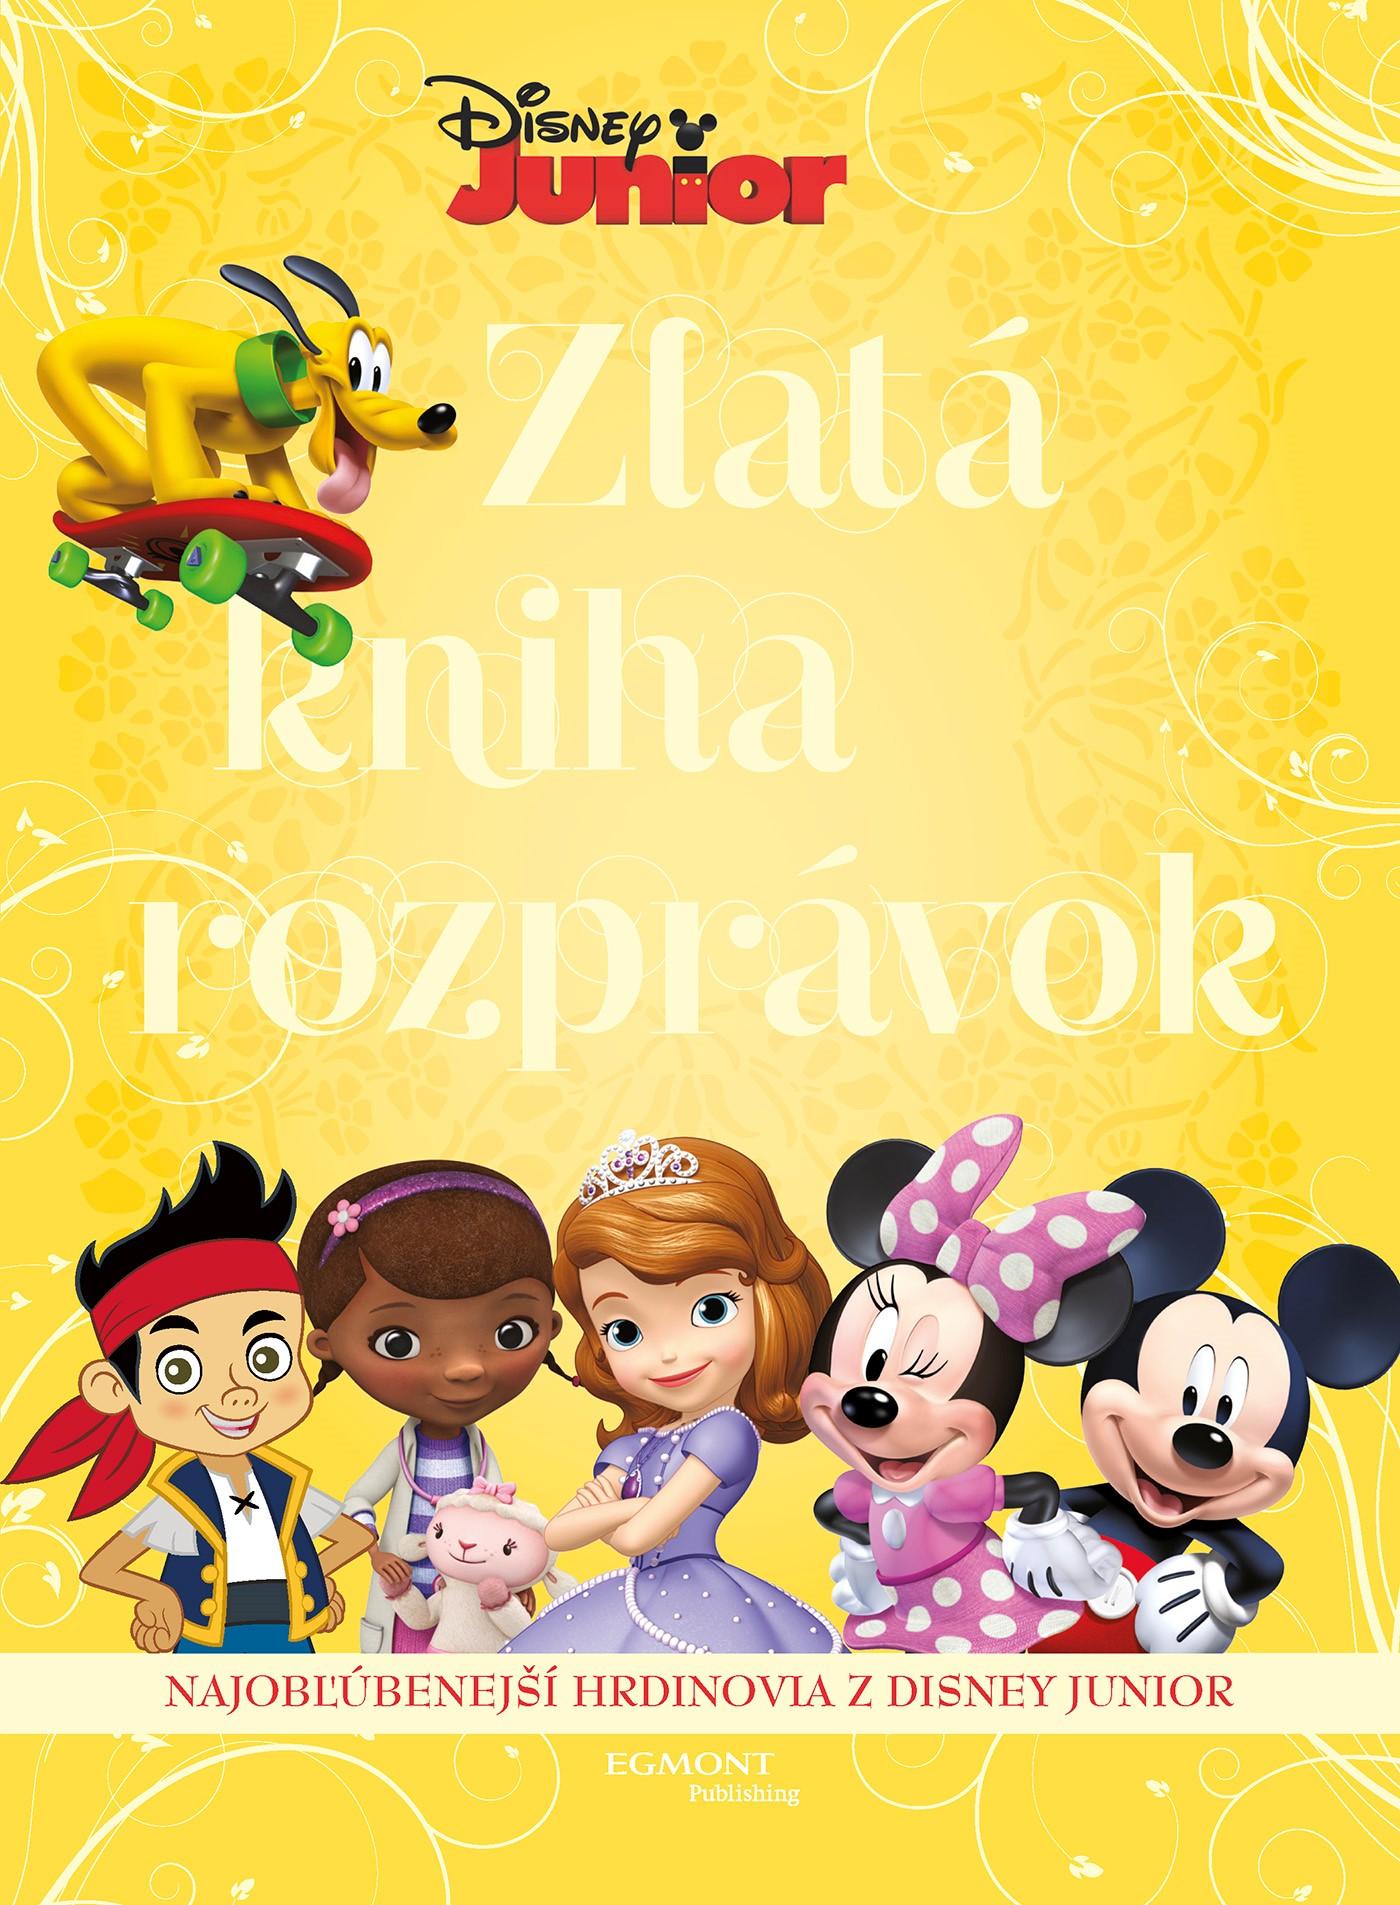 Disney Junior - Zlatá kniha rozprávok